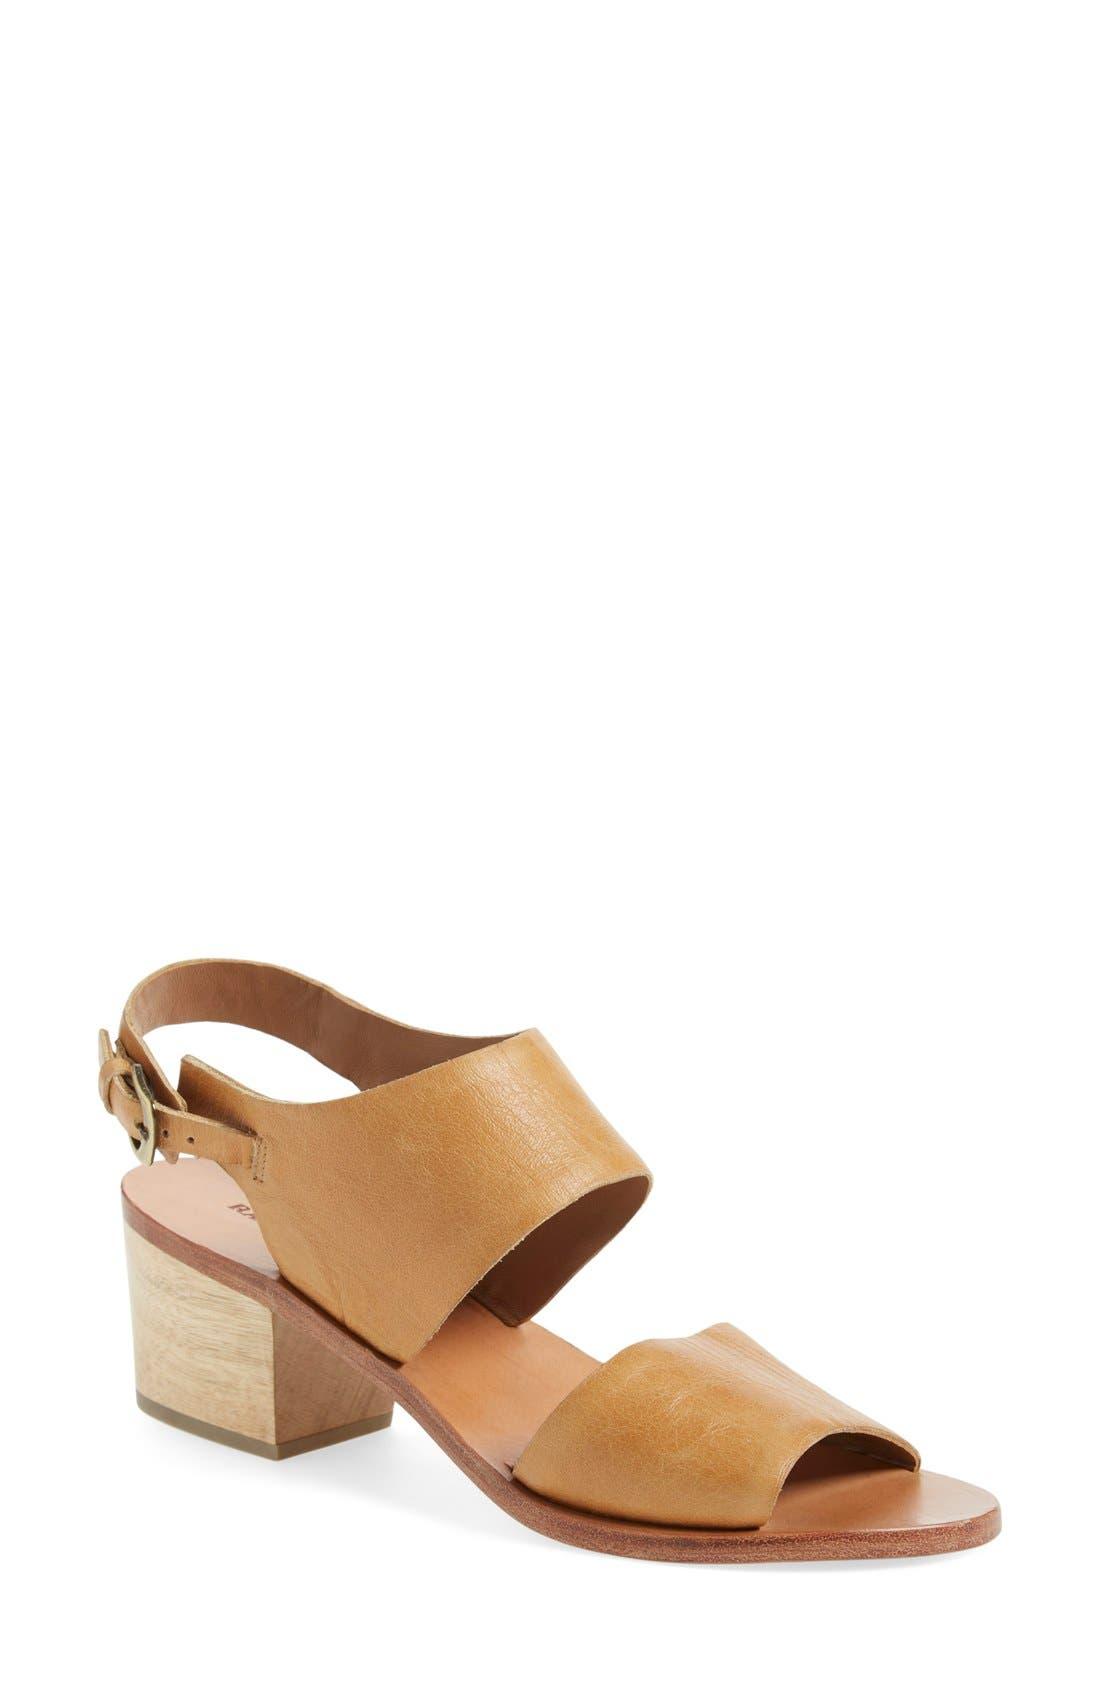 Main Image - Rachel Comey 'Tulip' Sandal (Women)